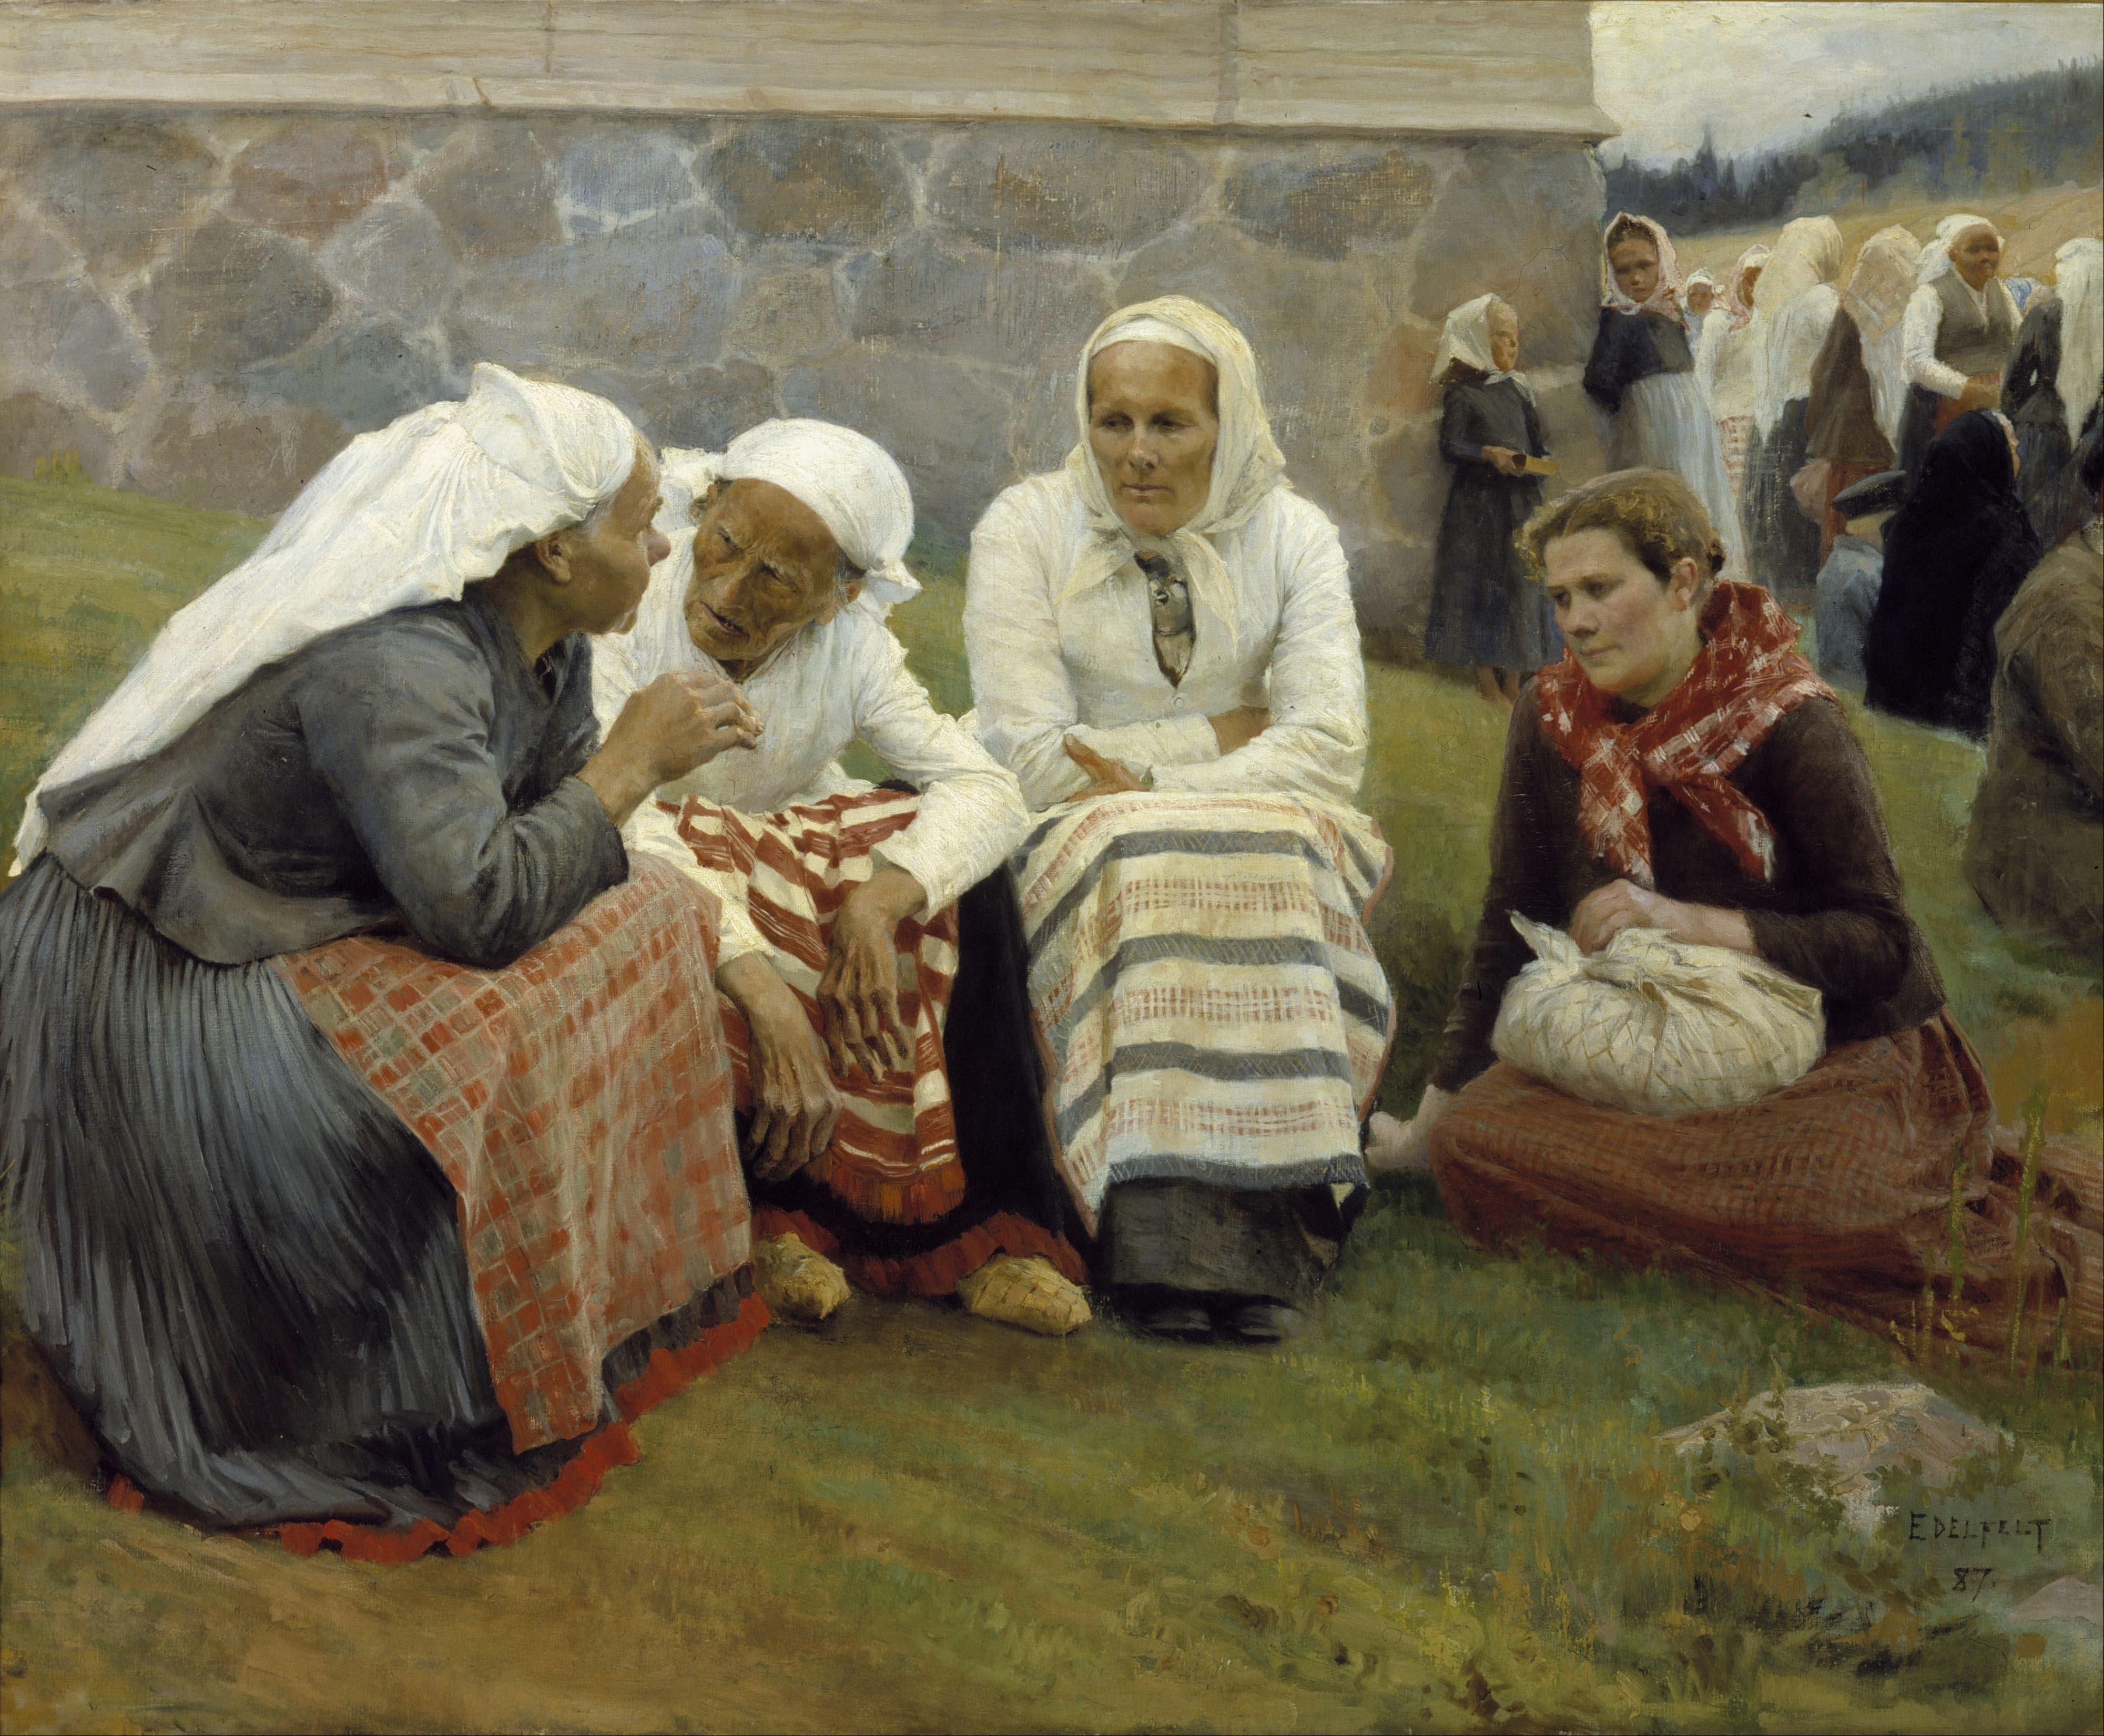 albert_edelfelt_-_women_outside_the_church_at_ruokolahti_-_google_art_project